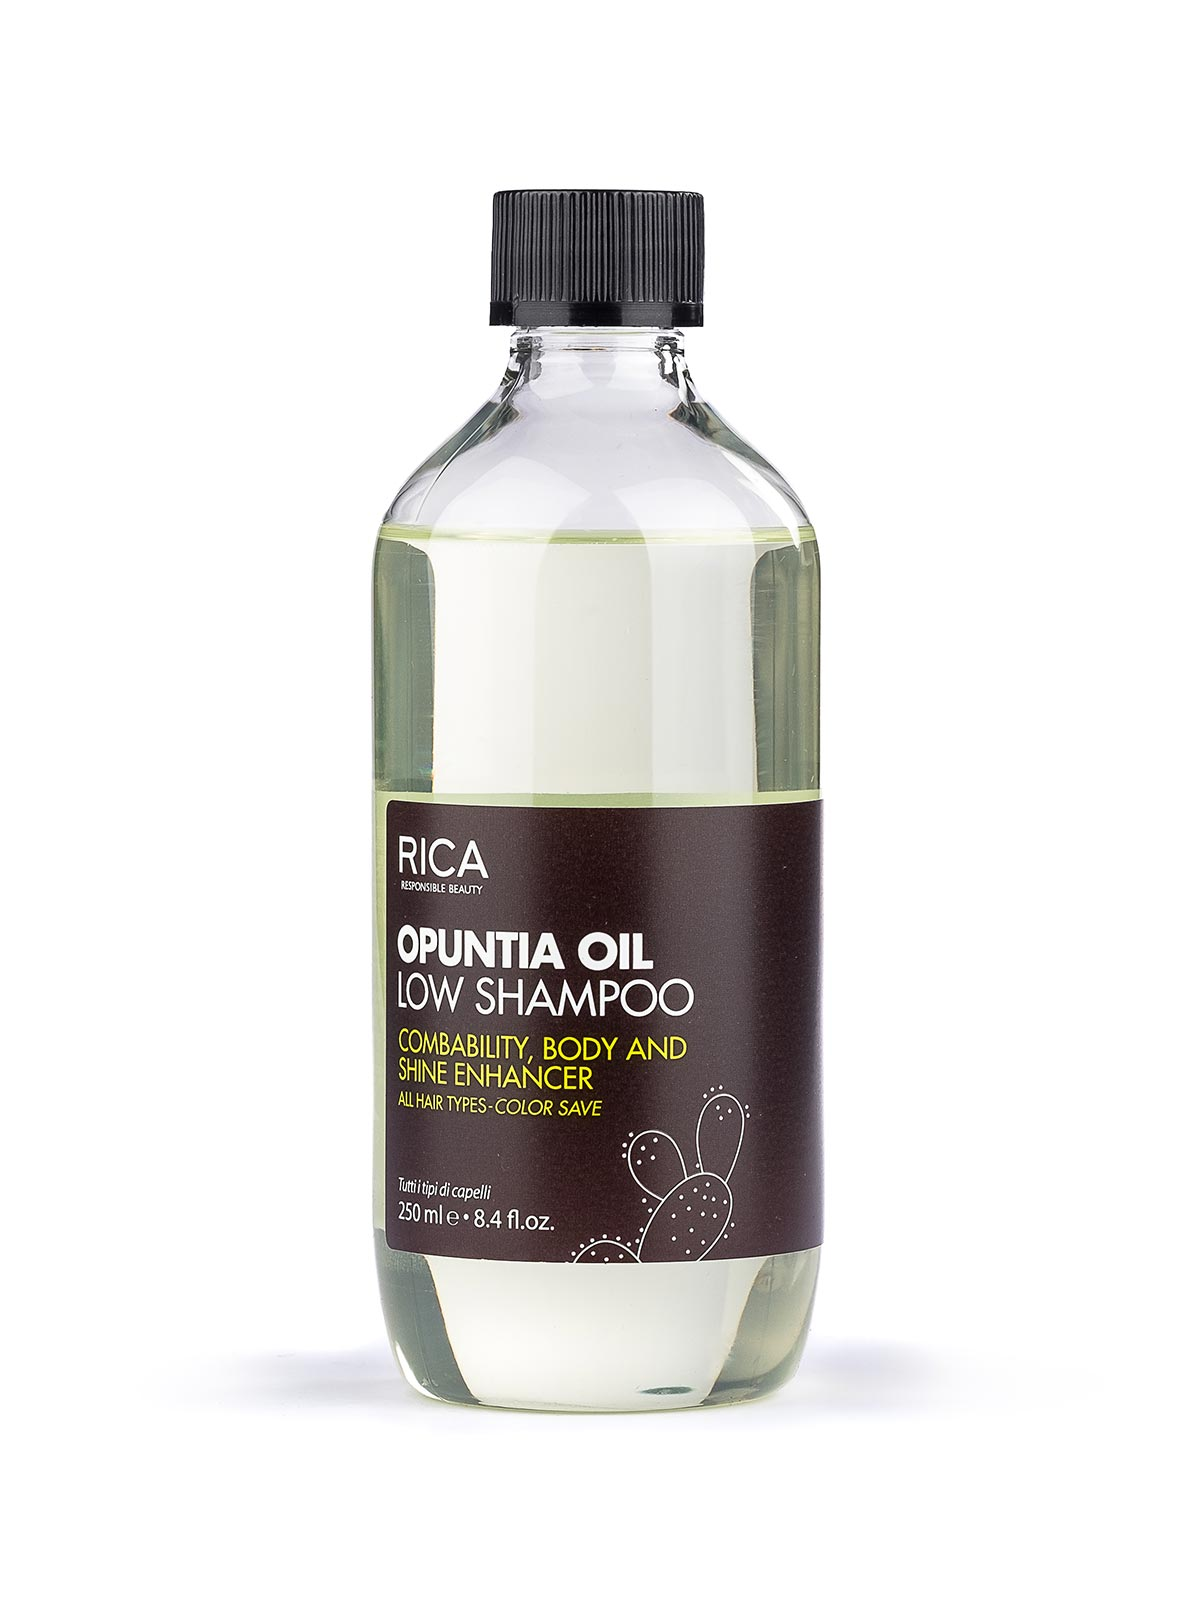 Rica Opuntia Oil Low Shampoo